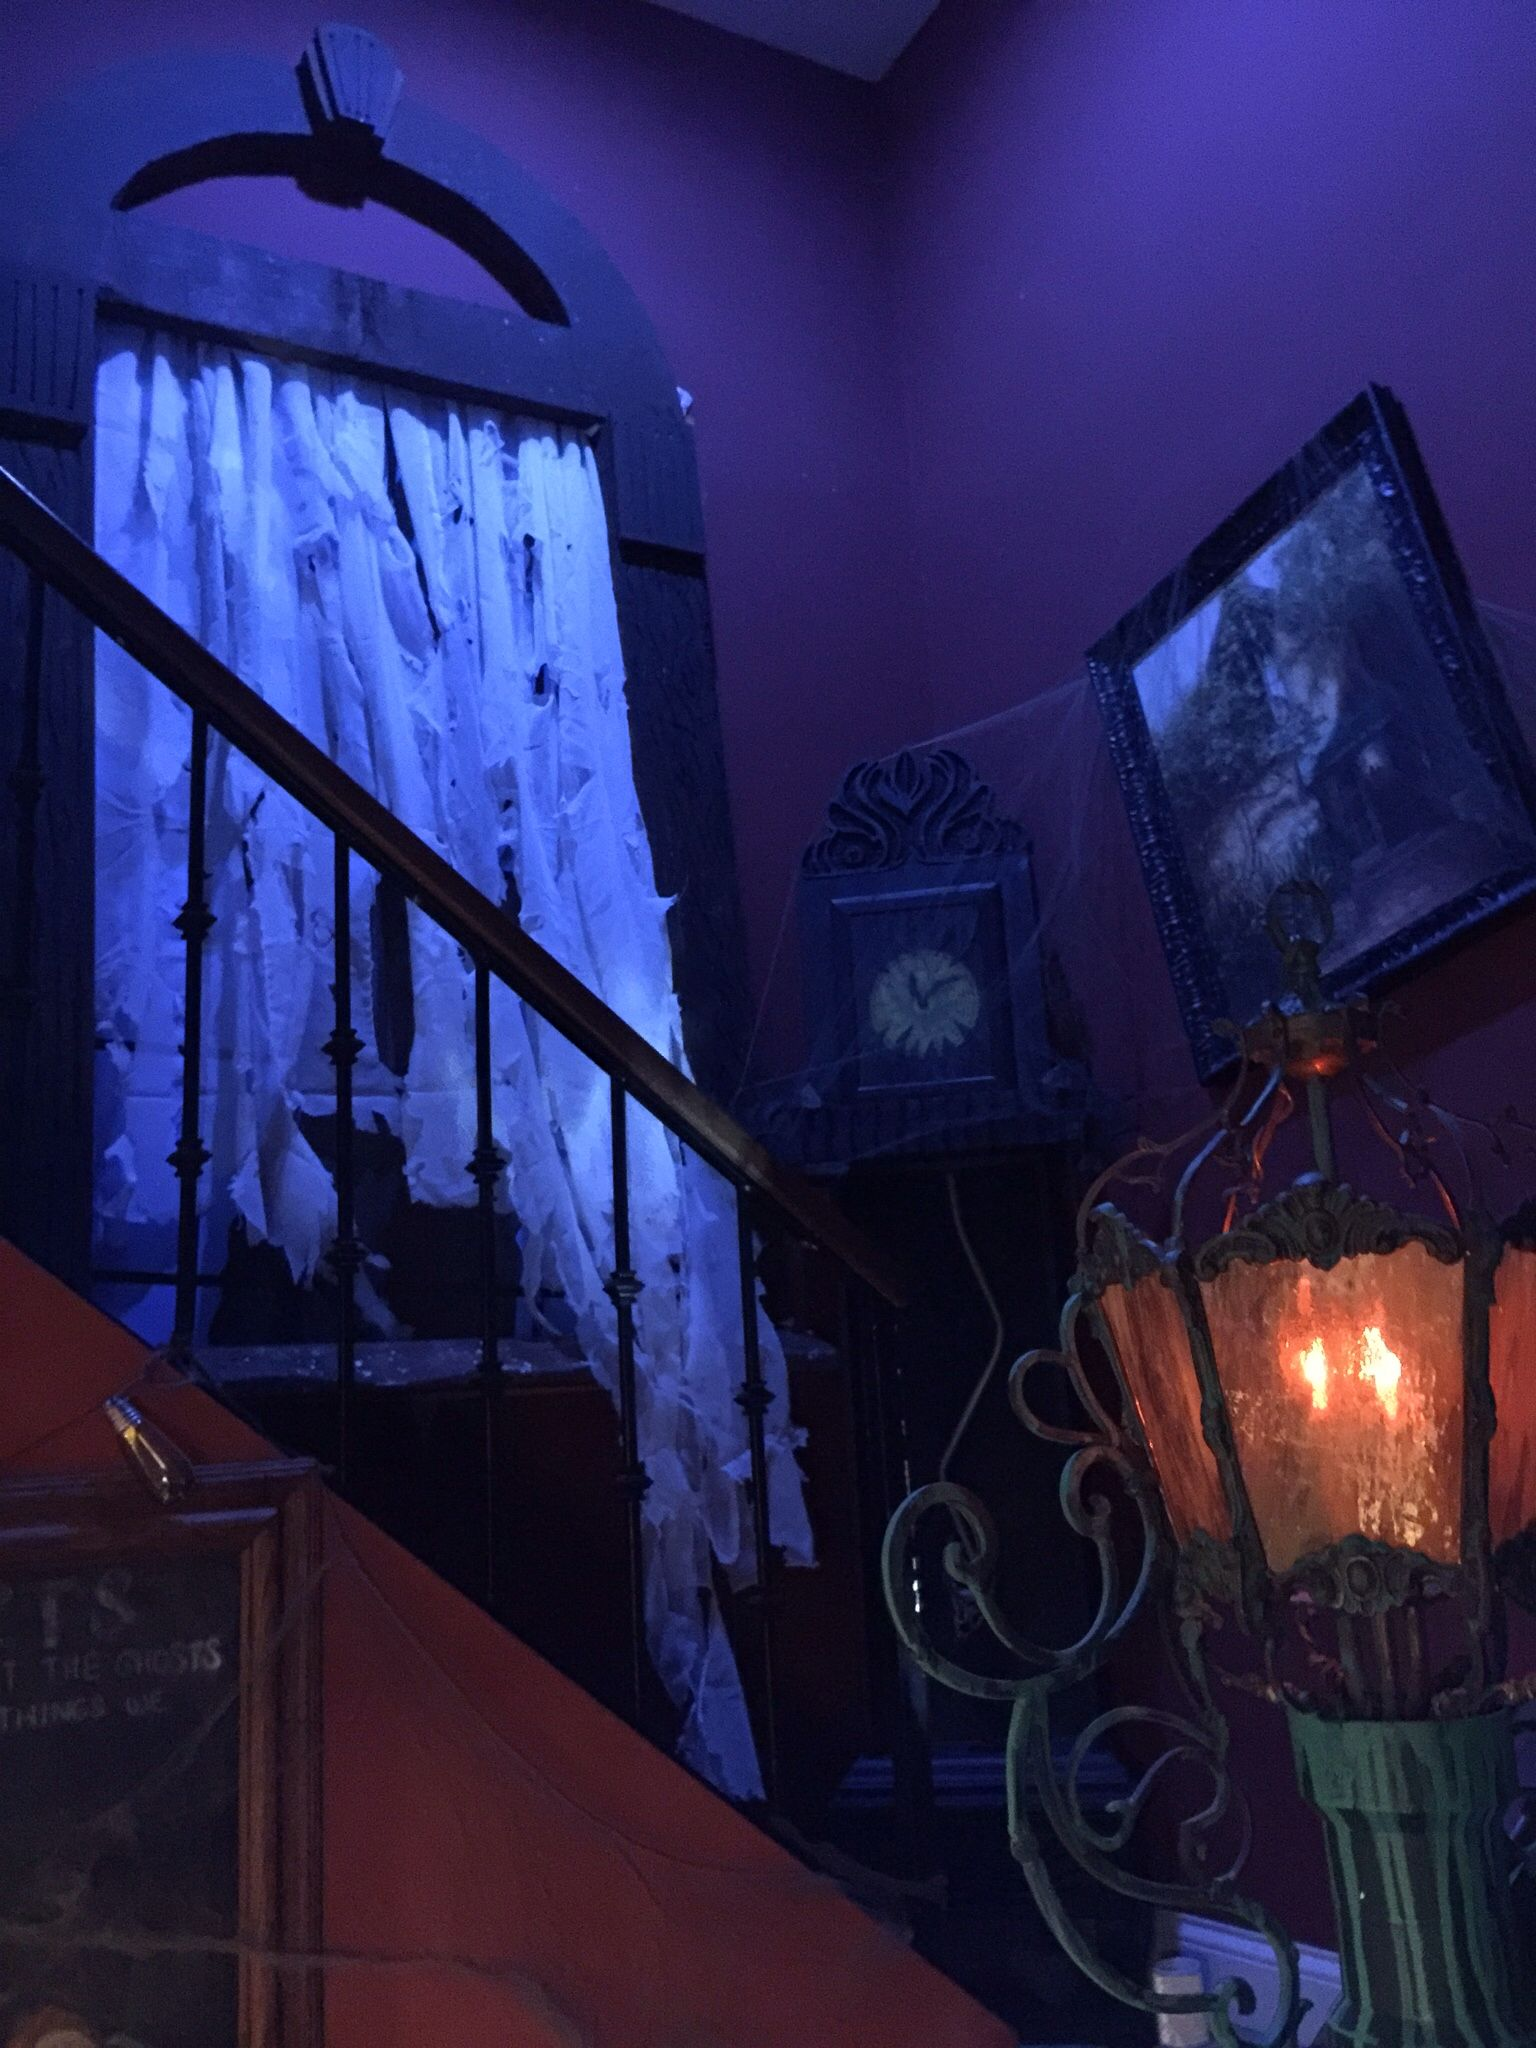 Halloween Decor With Effects on halloween themes, halloween cupcakes, halloween jewelry, halloween lighting, halloween ideas, halloween props, halloween costumes, halloween decorations, halloween hats, halloween masks product, halloween makeup, halloween cake, halloween gifts, halloween wallpaper, halloween candles, halloween candy, halloween movies, halloween clip art, halloween vintage, halloween wedding,